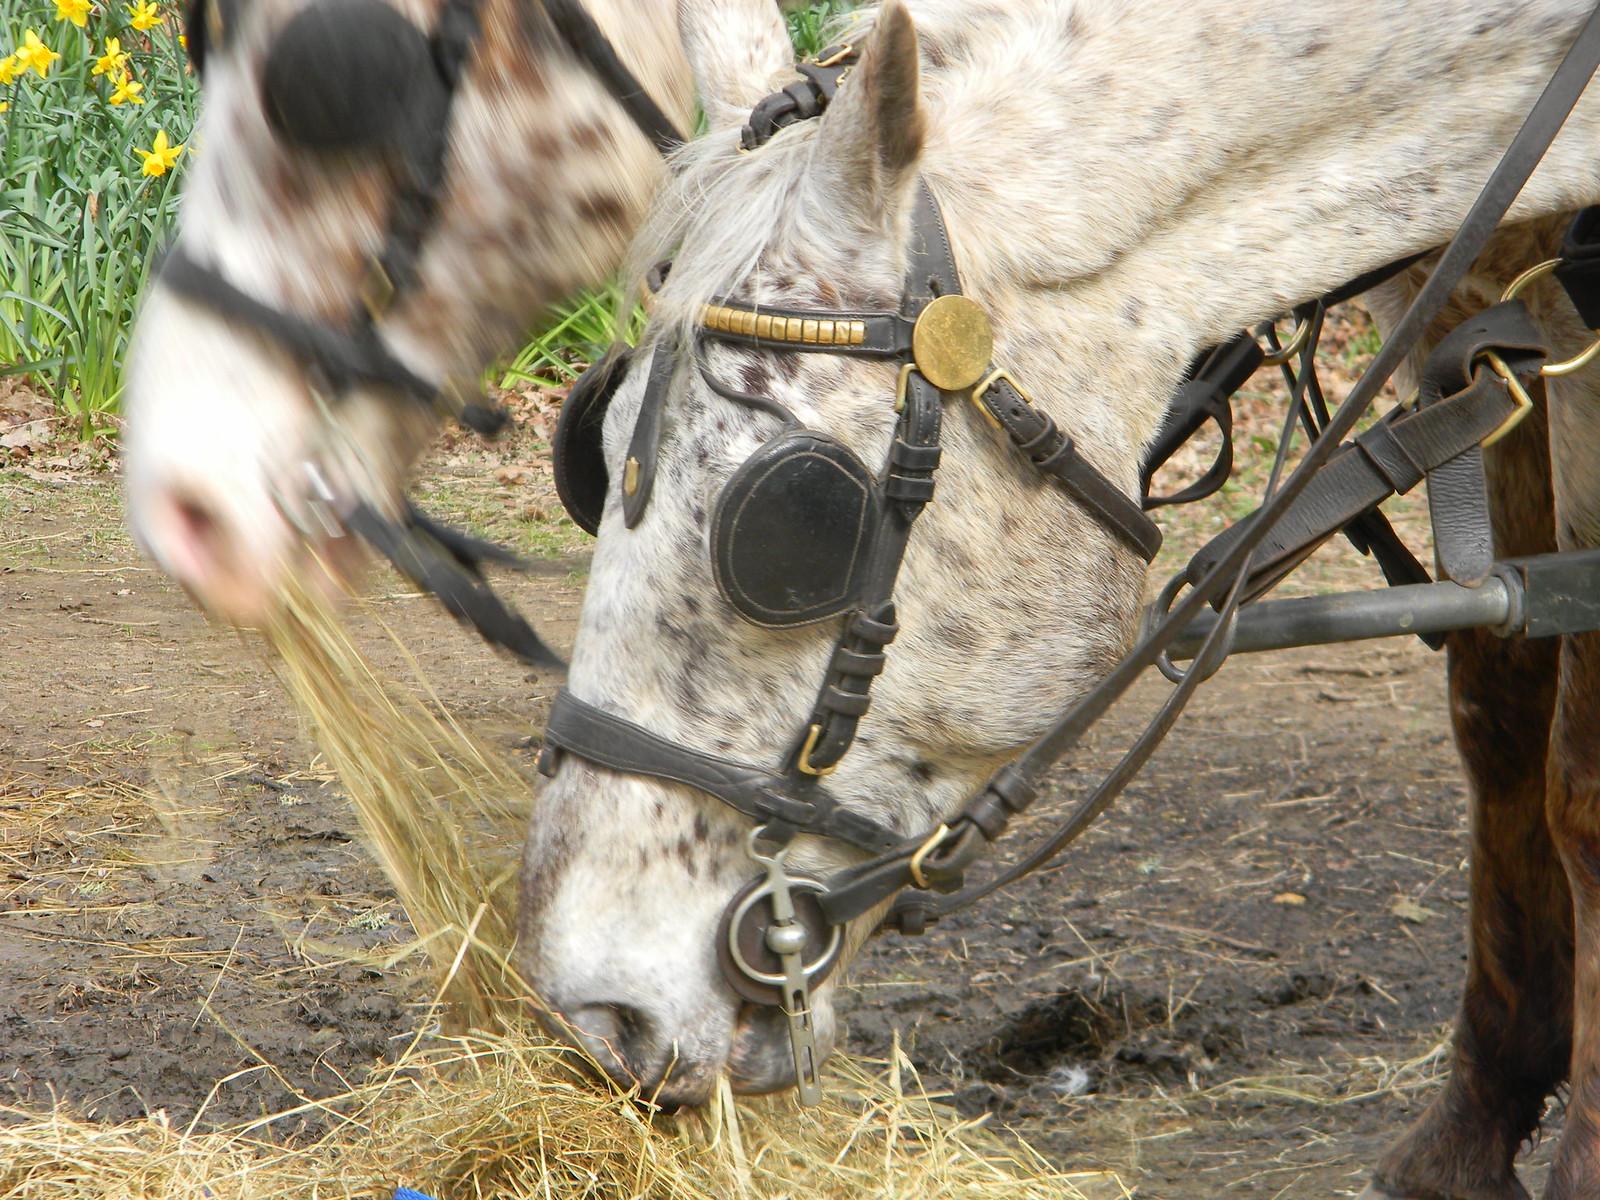 Horses, Winkworth Arboretum Milford to Godalming